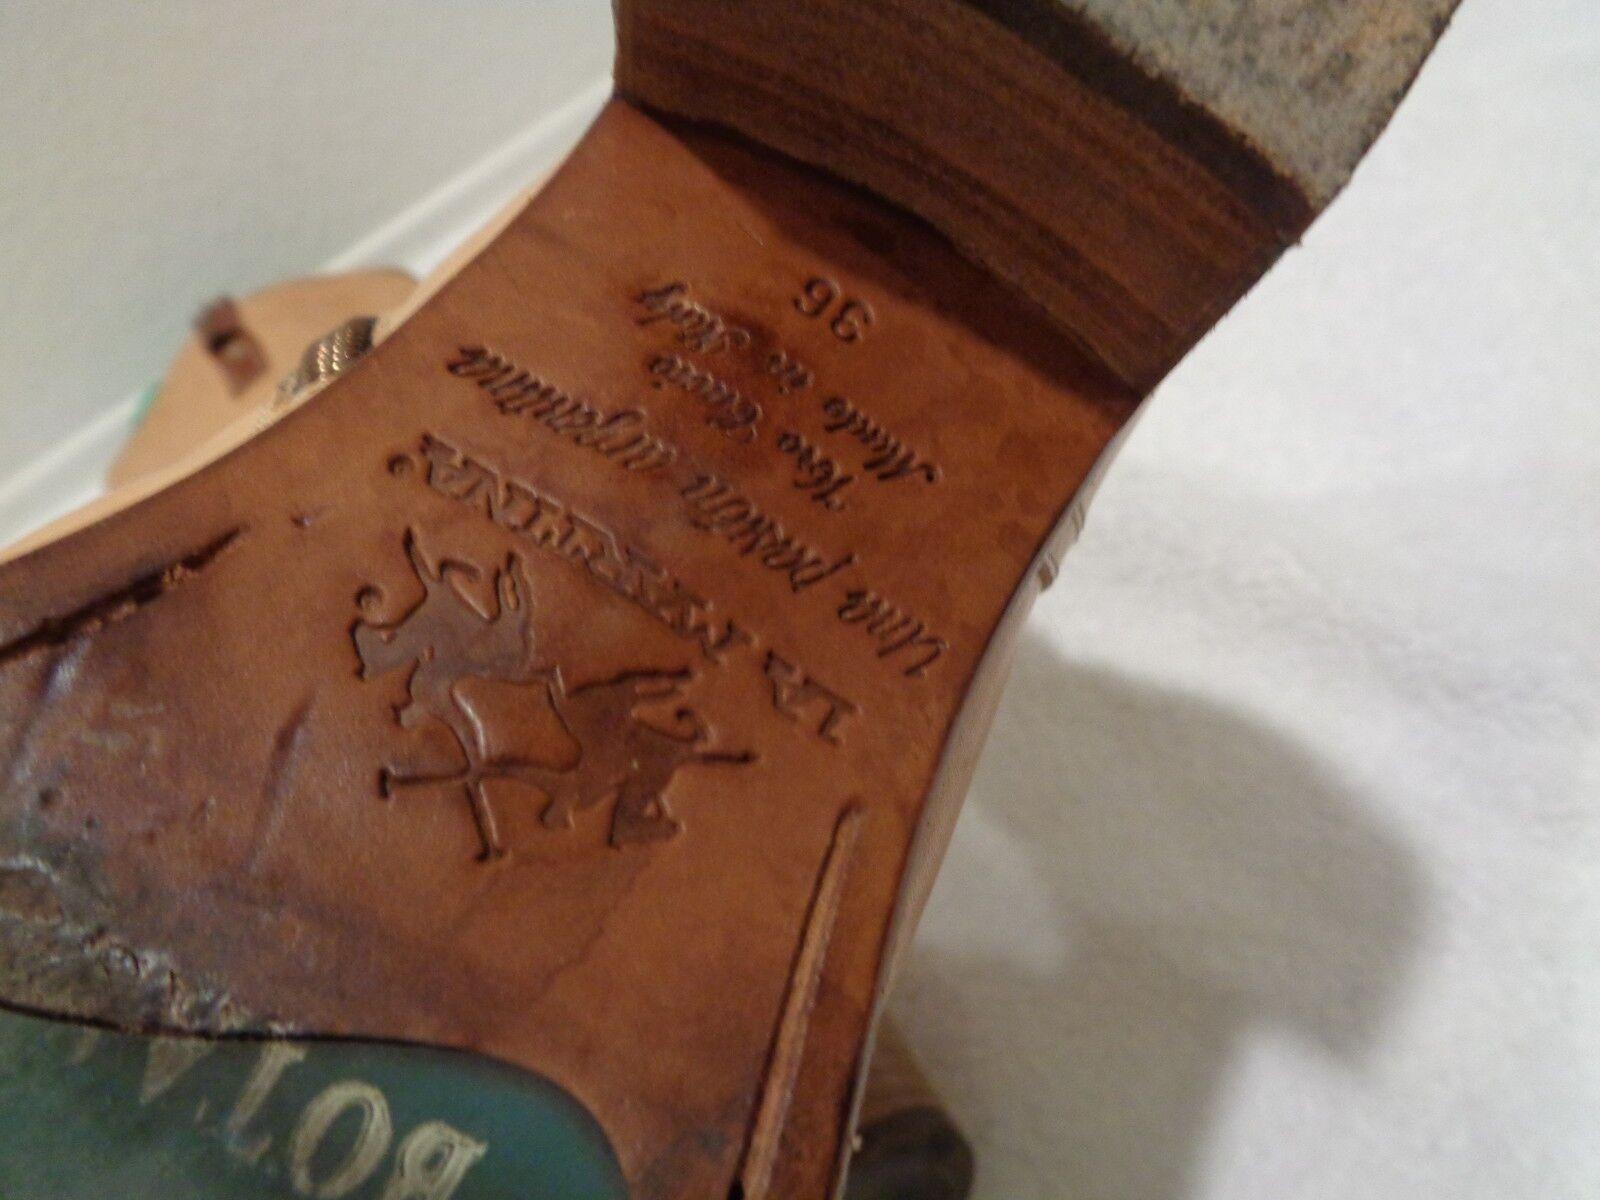 LA LA LA MARTINA una pasion silverina tall camel tall Boots SZ 36 6 db37c8